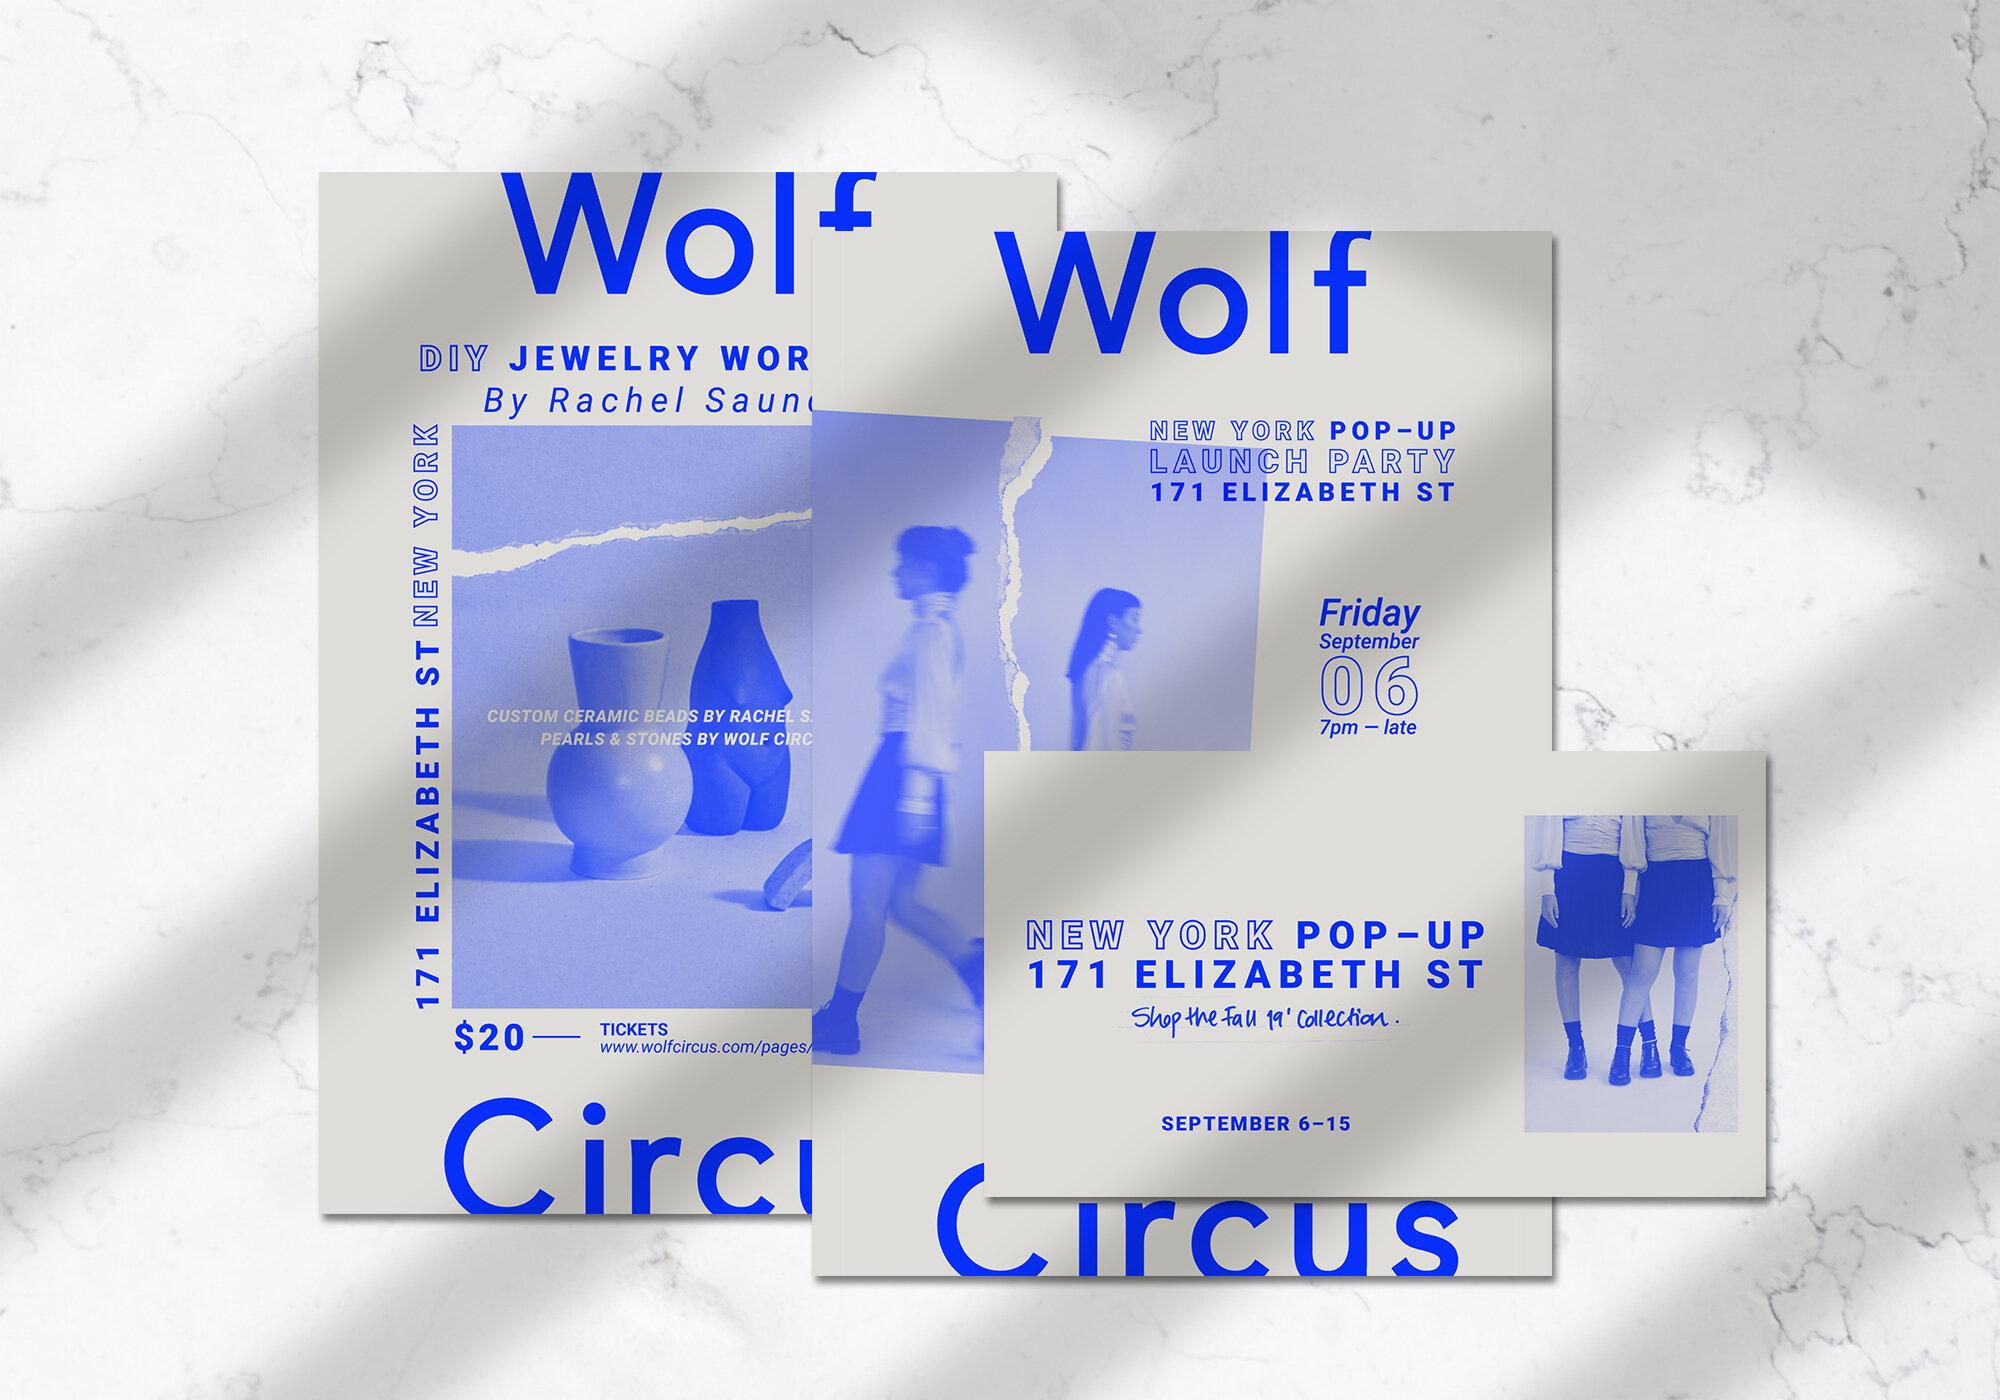 wolfcircus_01.jpg